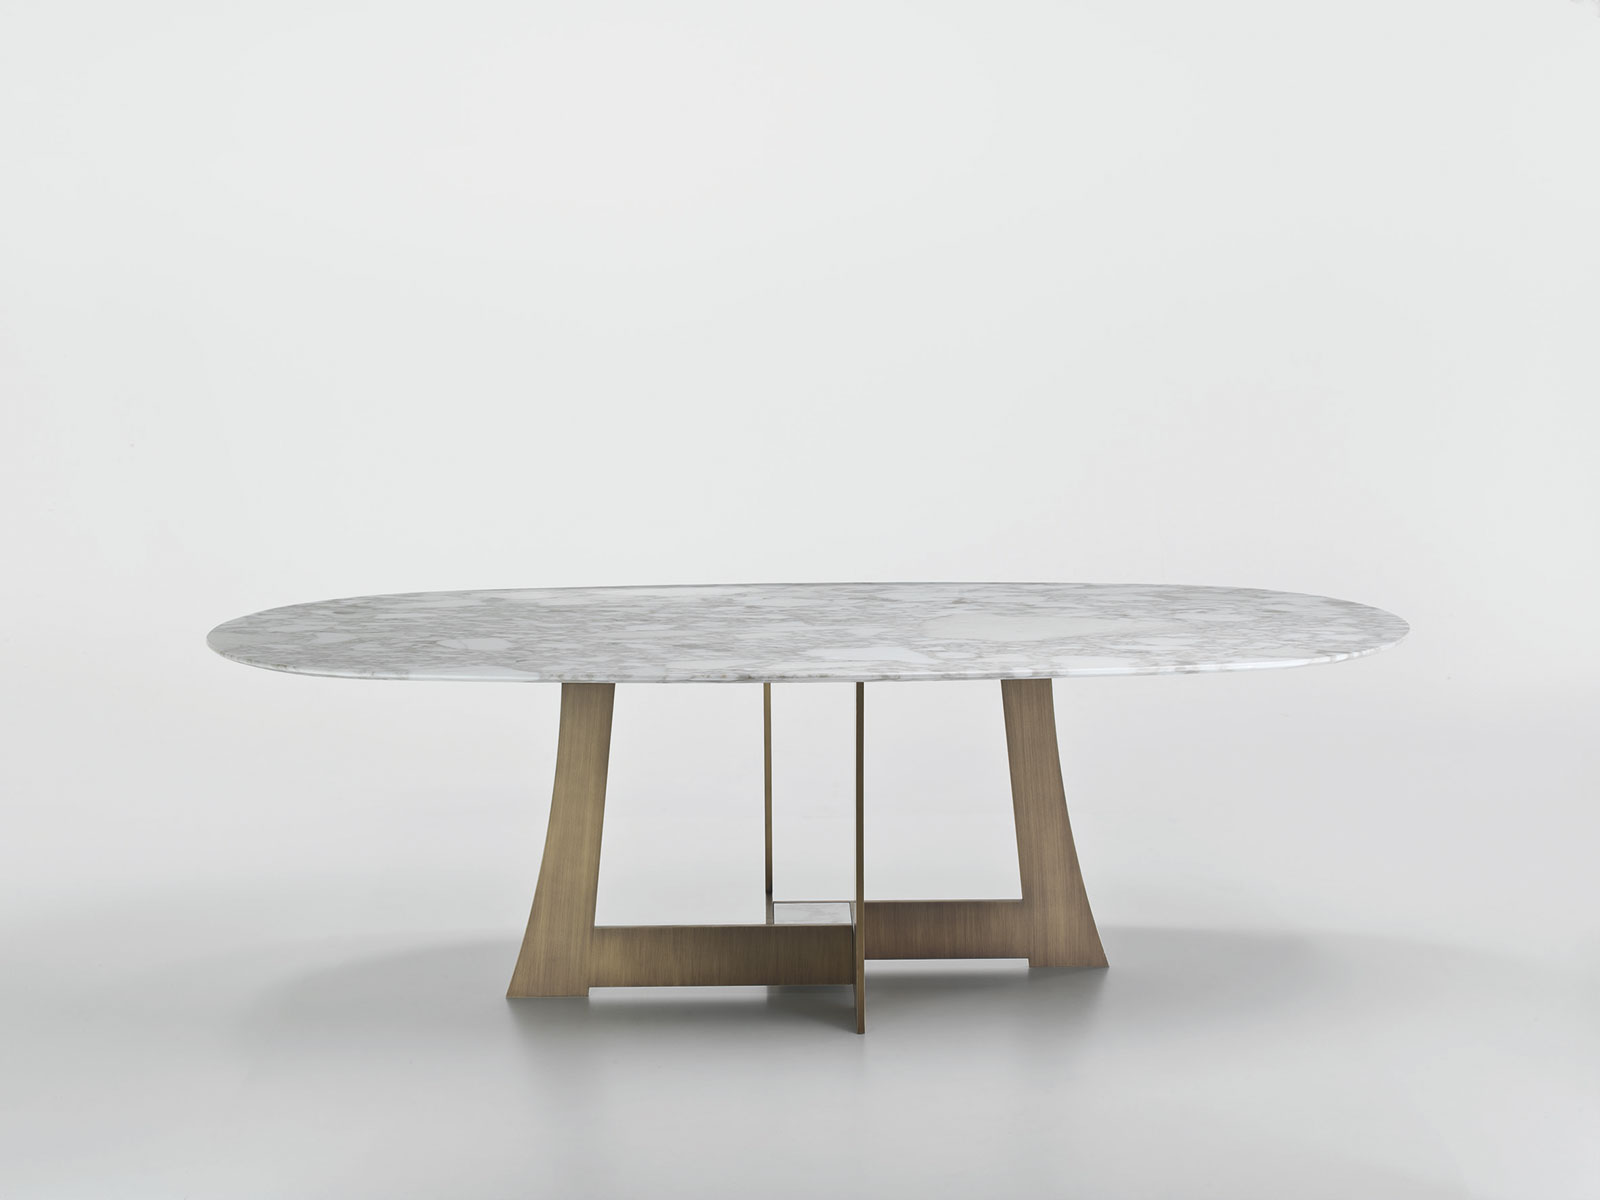 Table de repas ovale en marbre calacatta or signée Umberto Asnago. Vente en ligne de luxueuses tables design made in italy. Livraison gratuite.